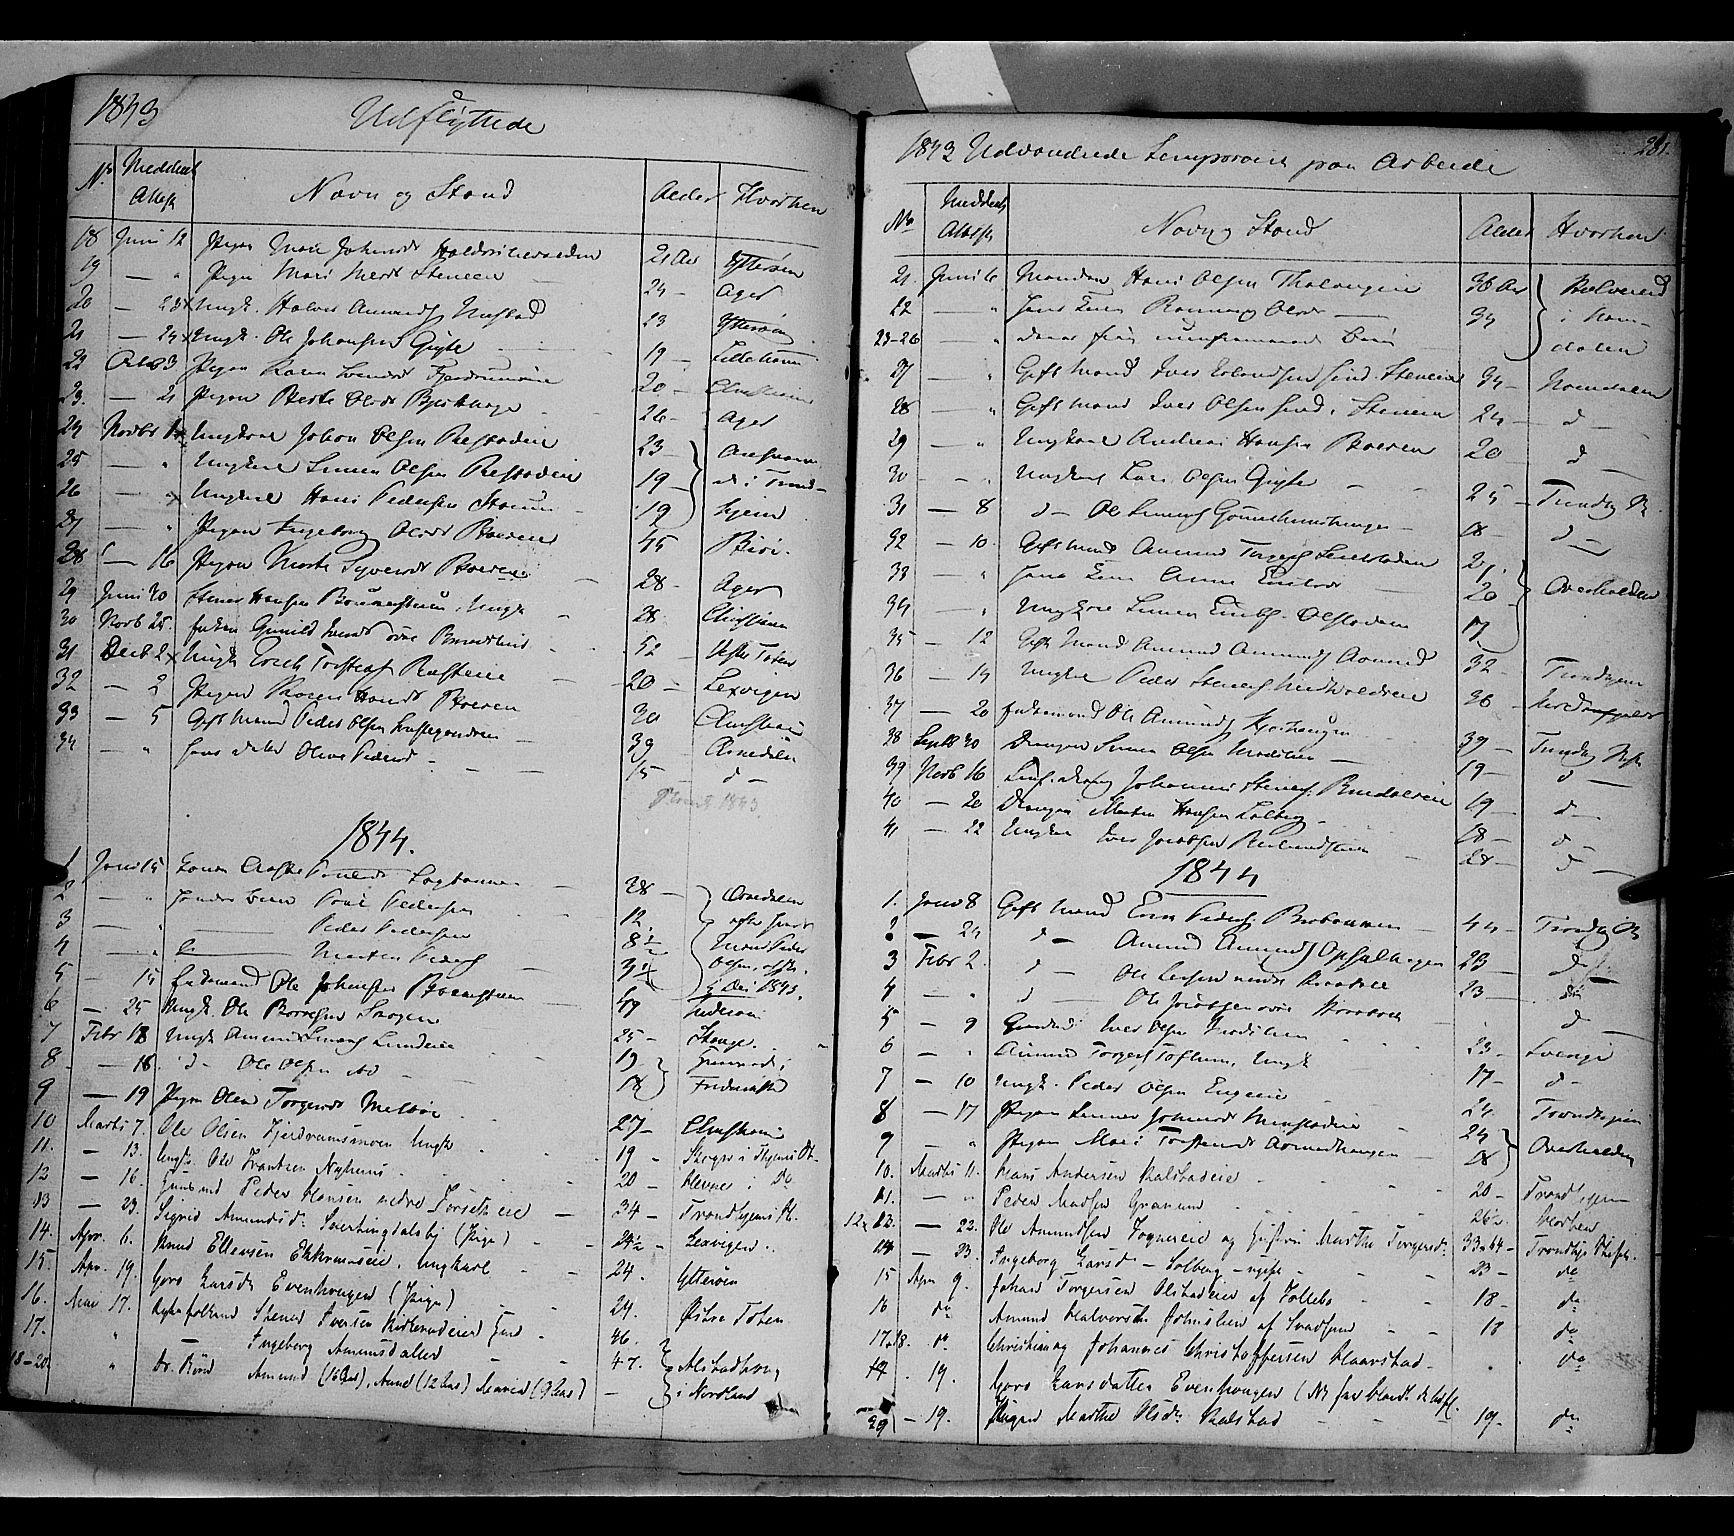 SAH, Gausdal prestekontor, Ministerialbok nr. 7, 1840-1850, s. 281